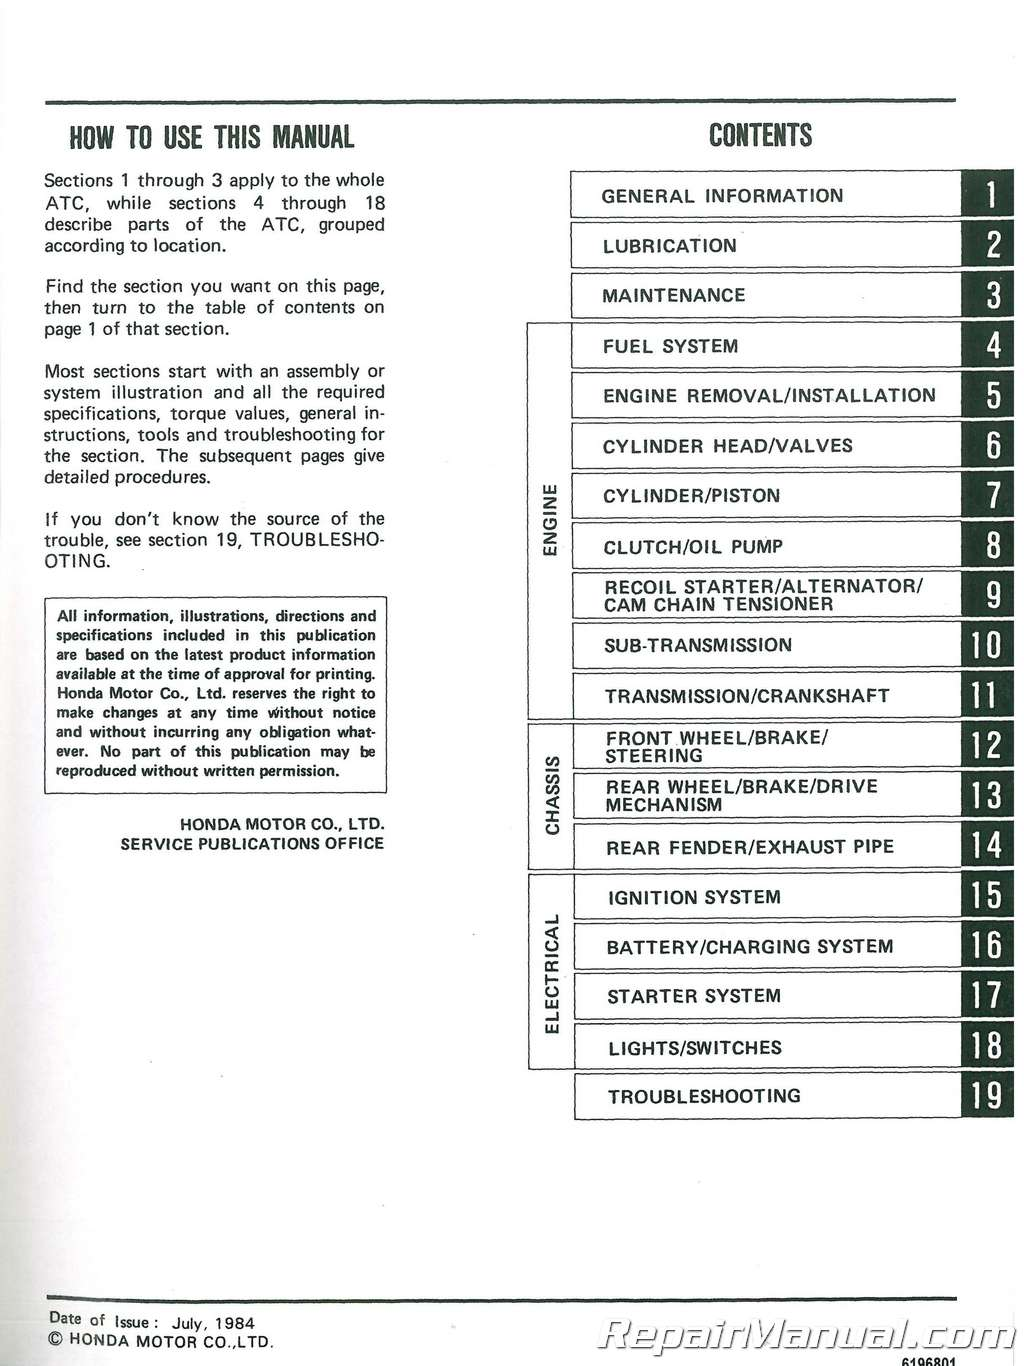 Honda Atc125m Wiring Diagram Trx300 Fourtrax Sl175 125m On 1984 1985 Atc Atv Three Wheeler Service Manual